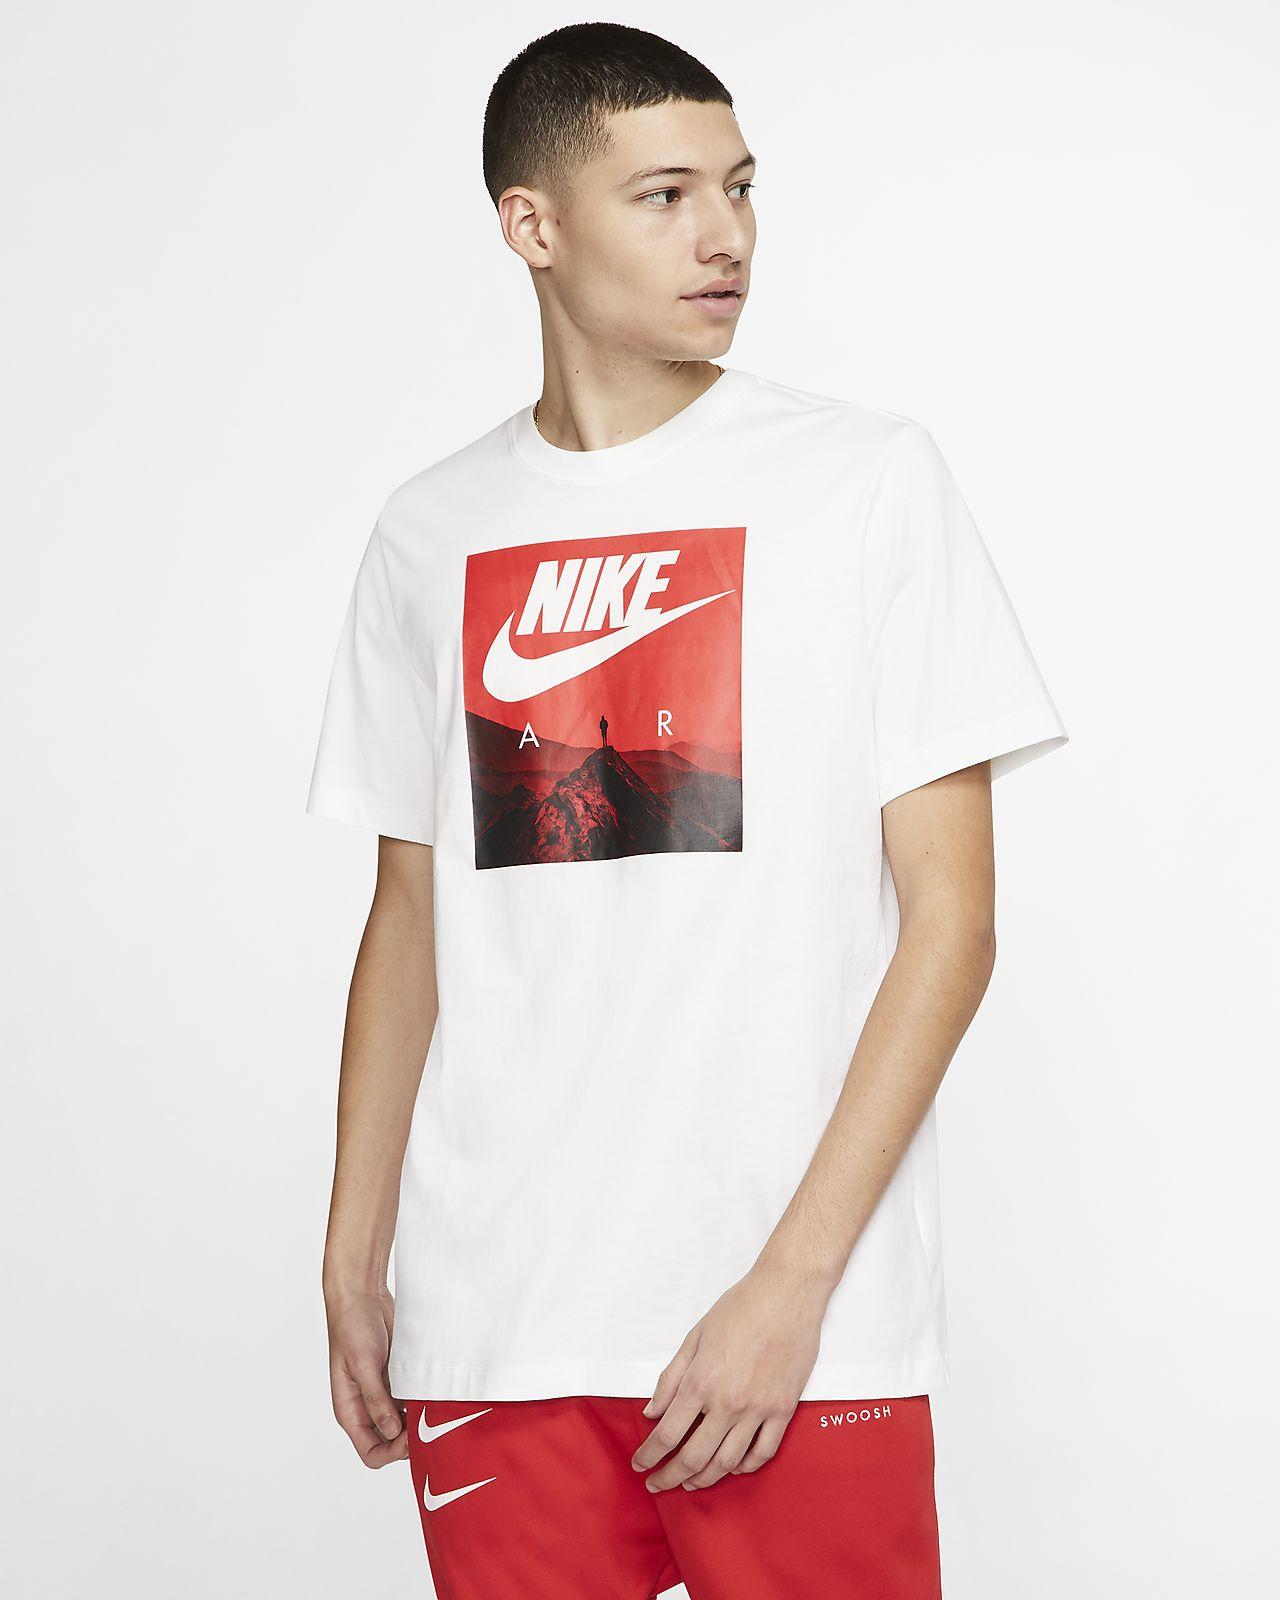 Playera para hombre Nike Air